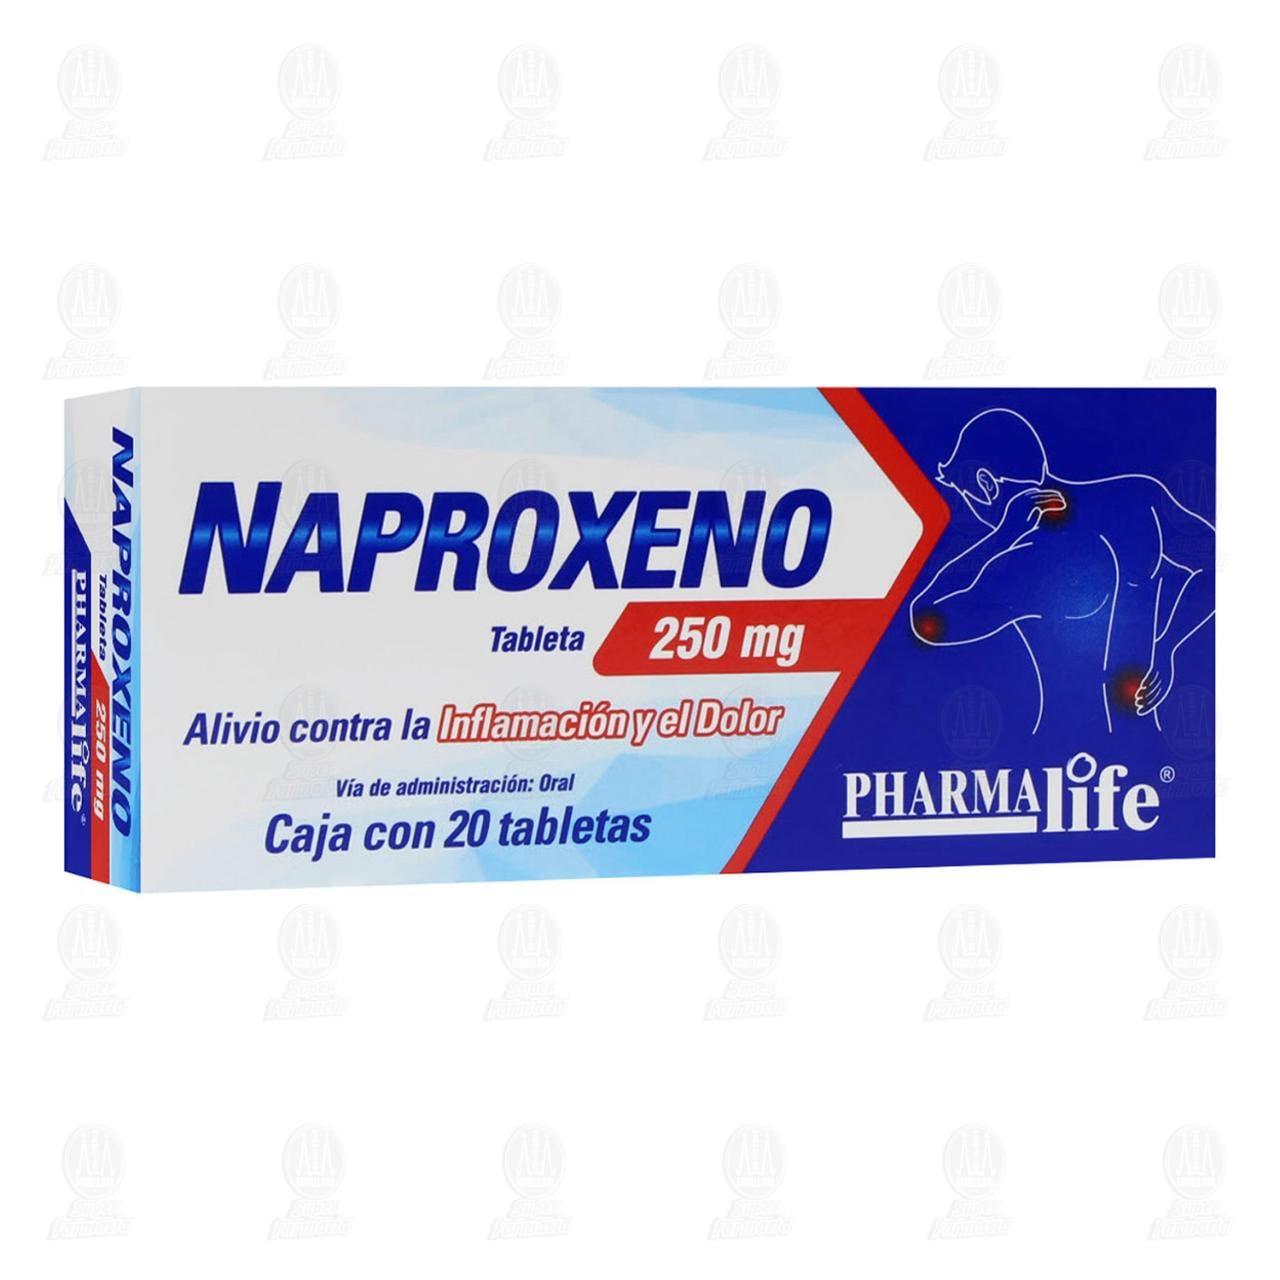 Comprar Naproxeno 250mg 20 Tabletas Pharmalife en Farmacias Guadalajara